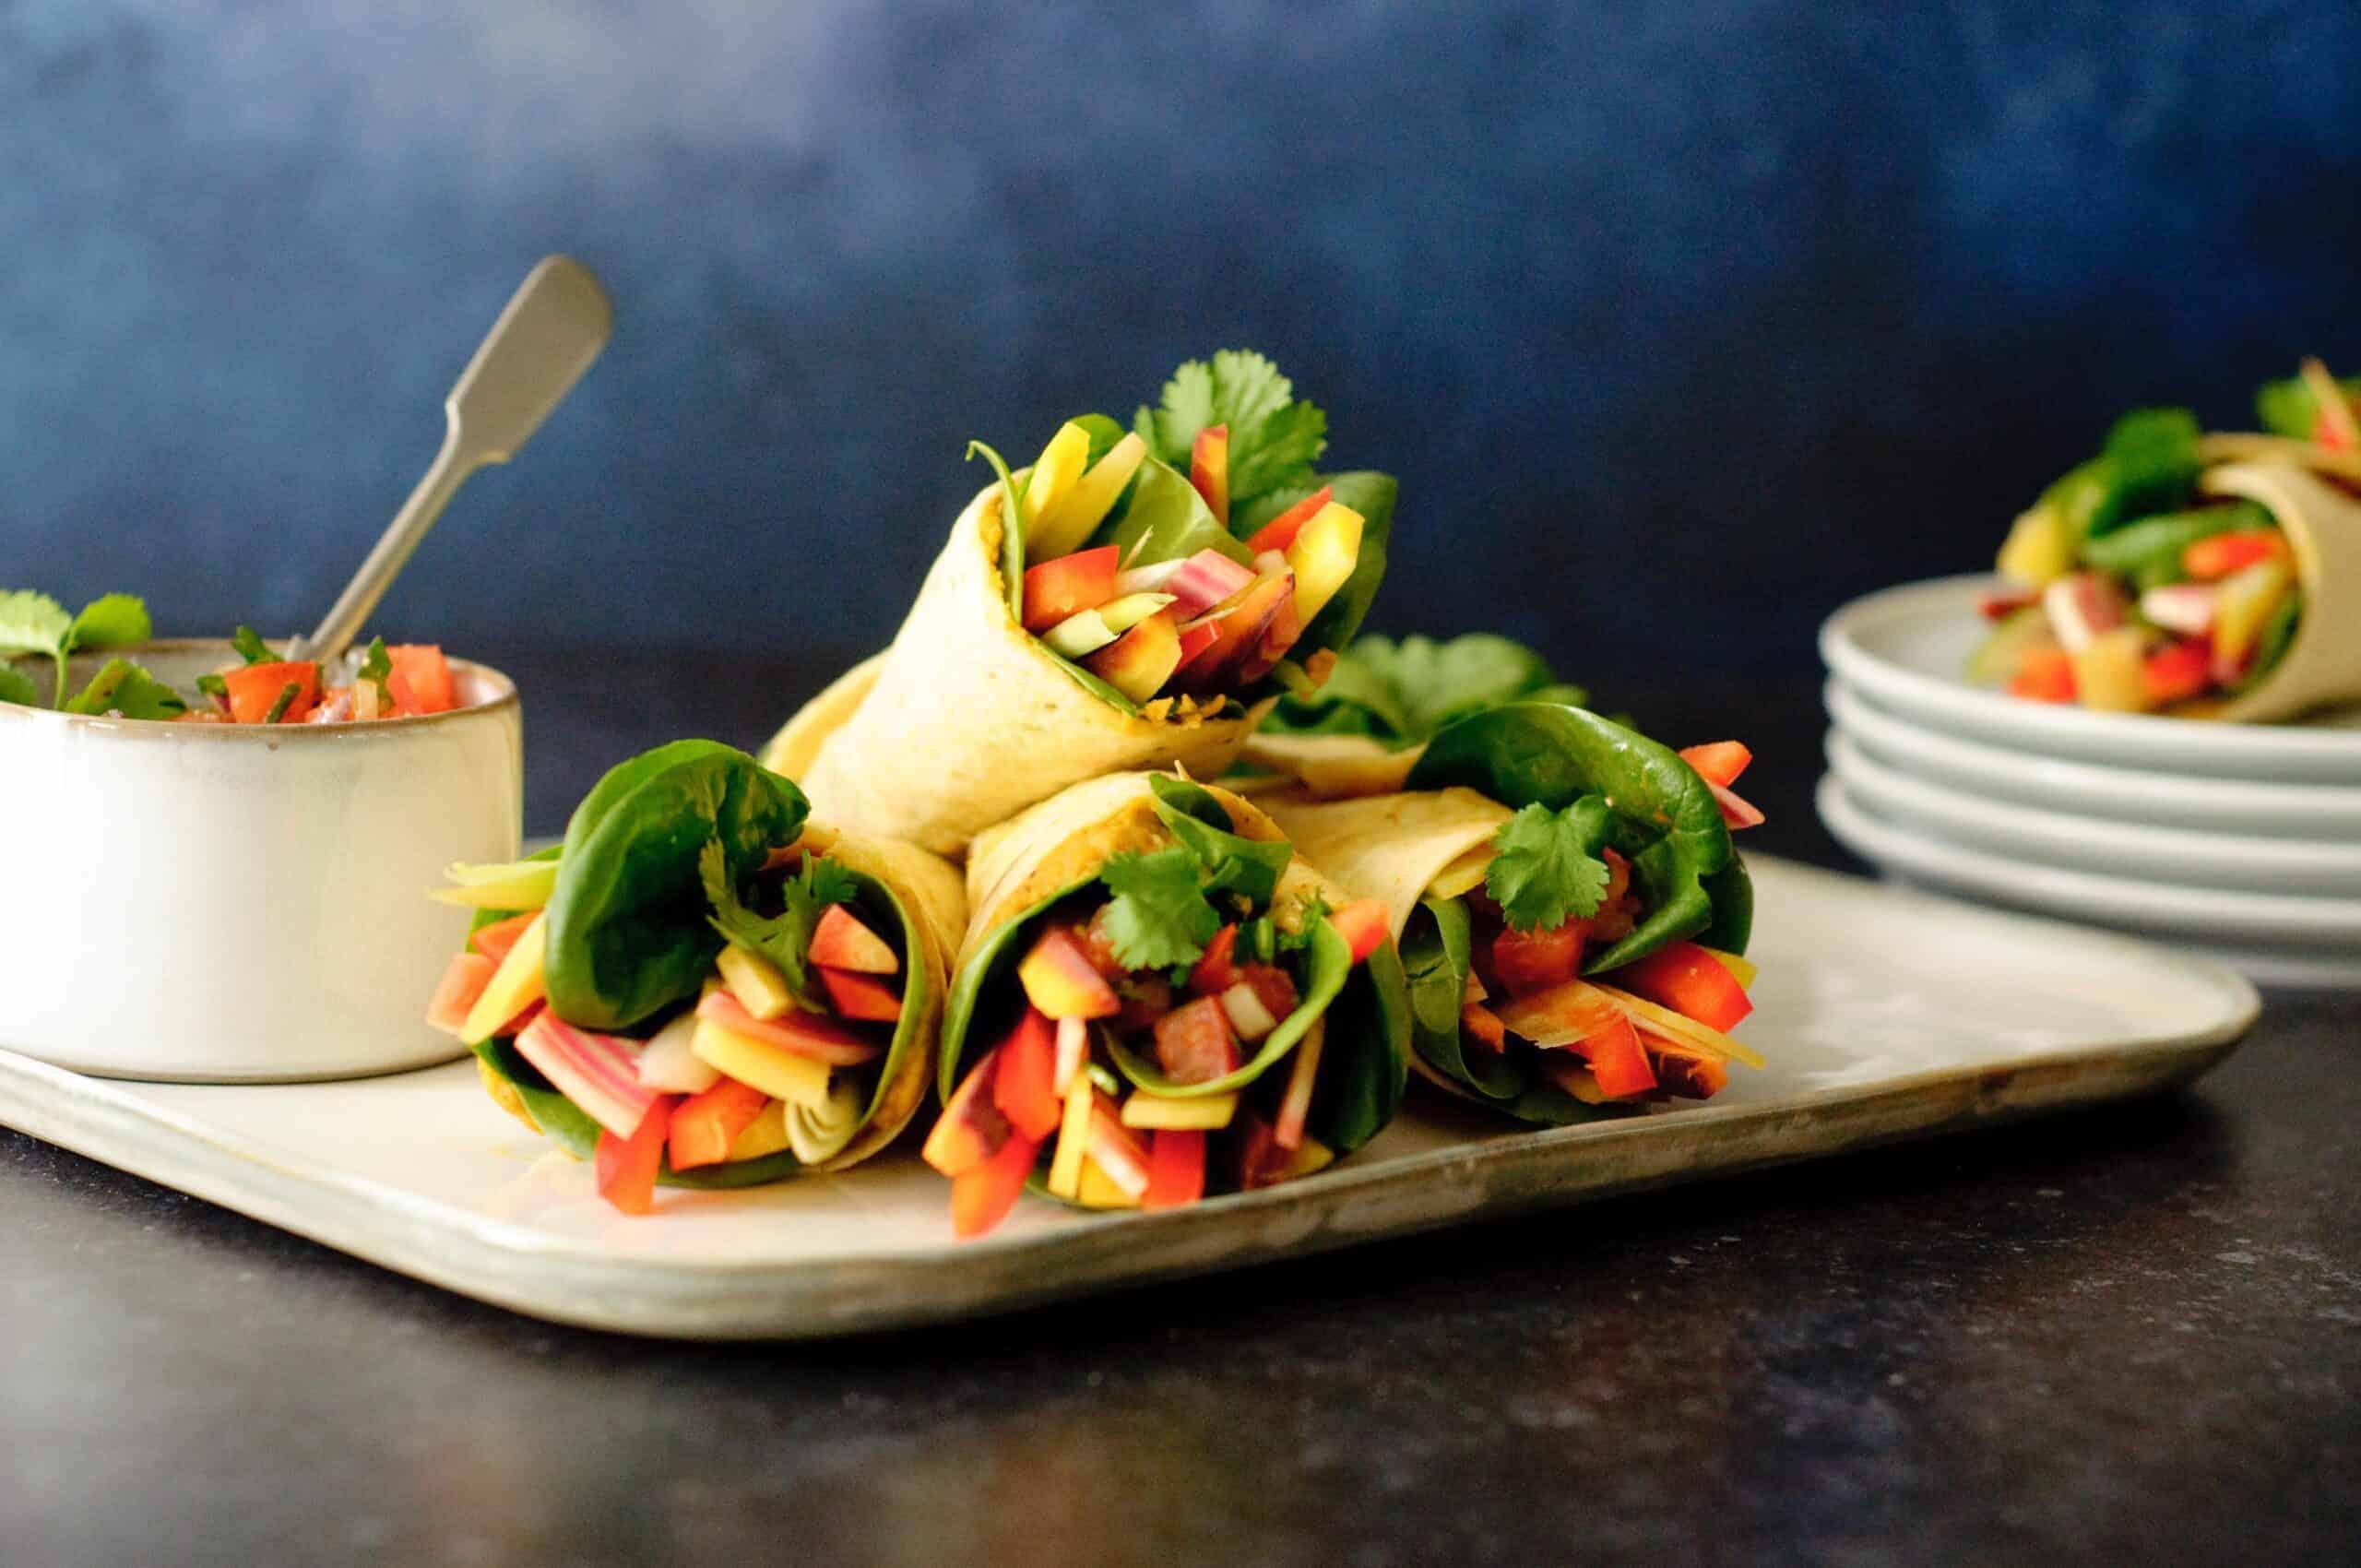 Wraps rauwkost hummus & salsa